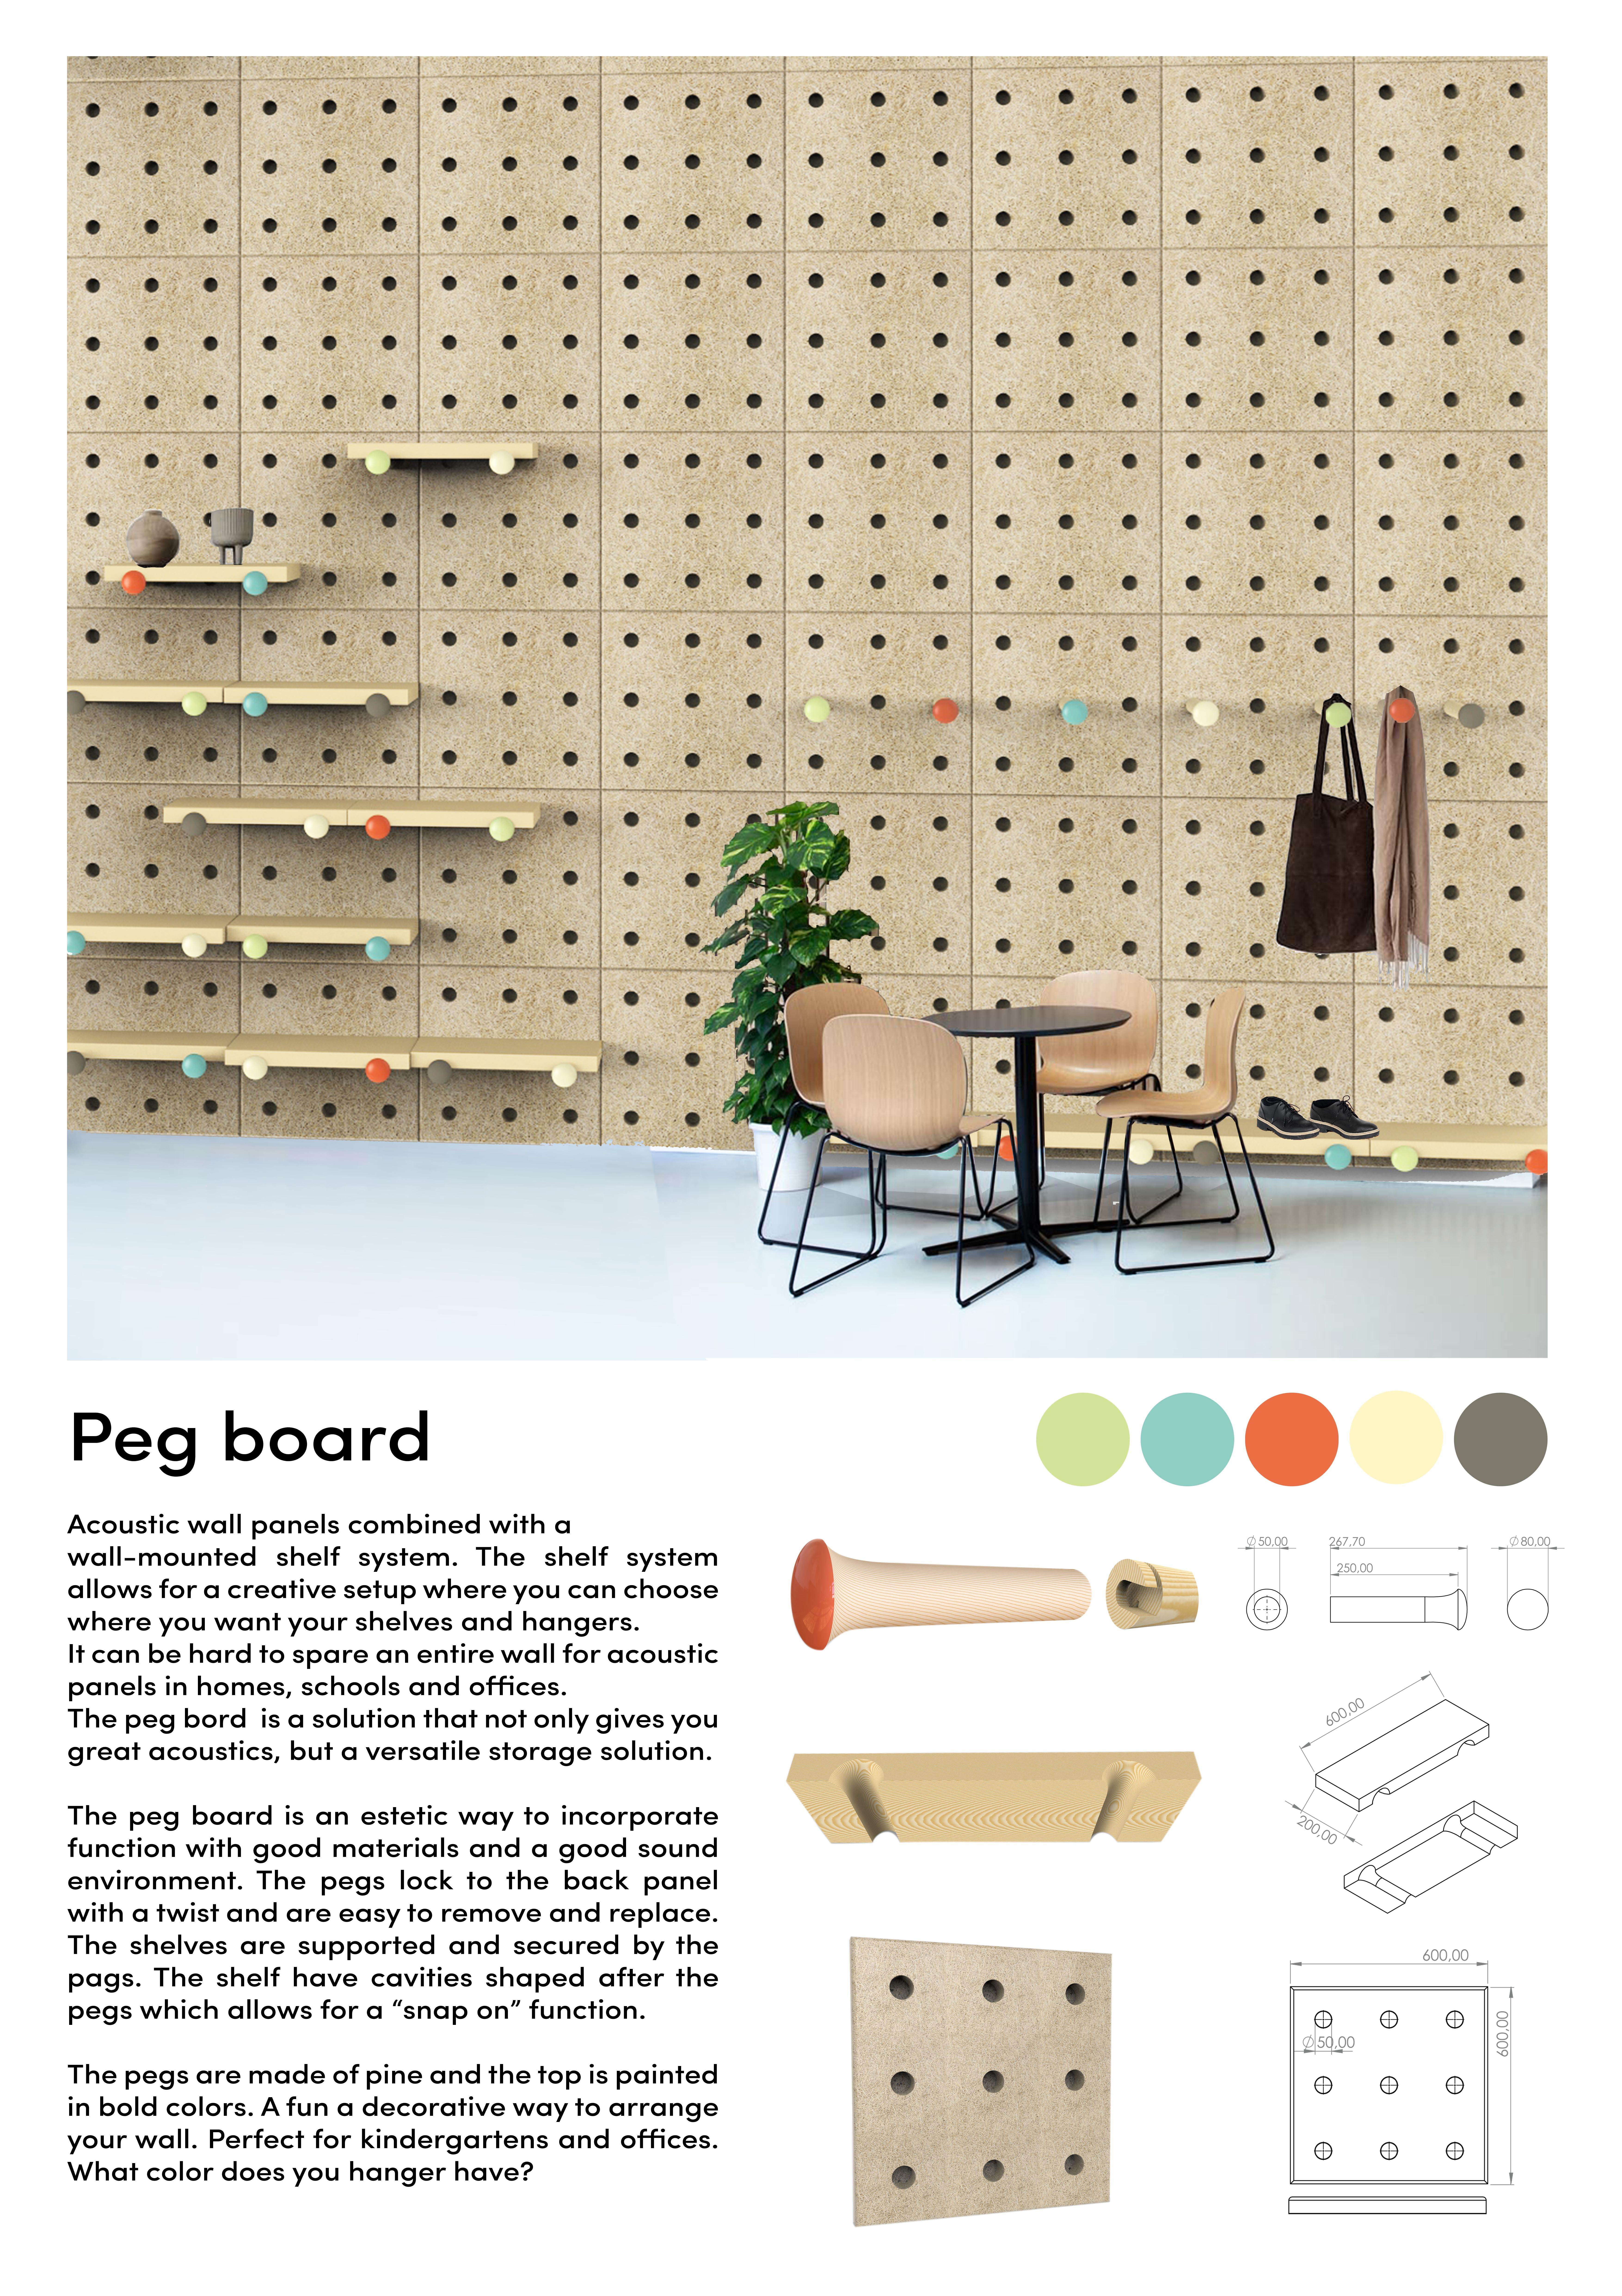 Mika Lindblad - Peg board